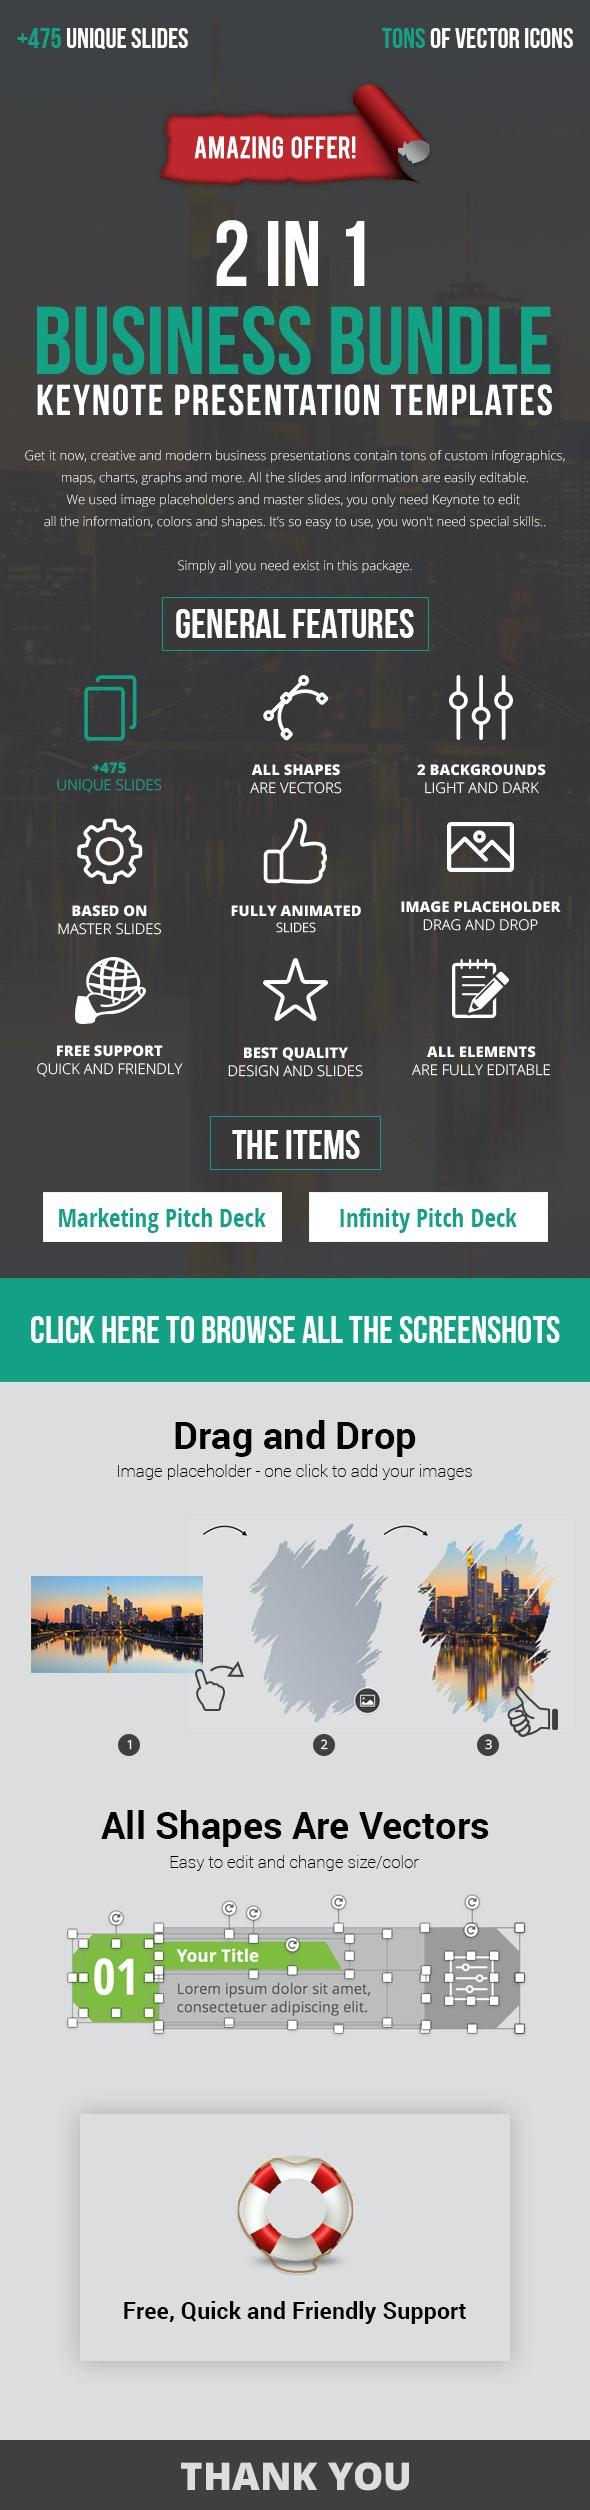 2 in 1 Great Keynote Pitch Deck Bundle - Business Keynote Templates